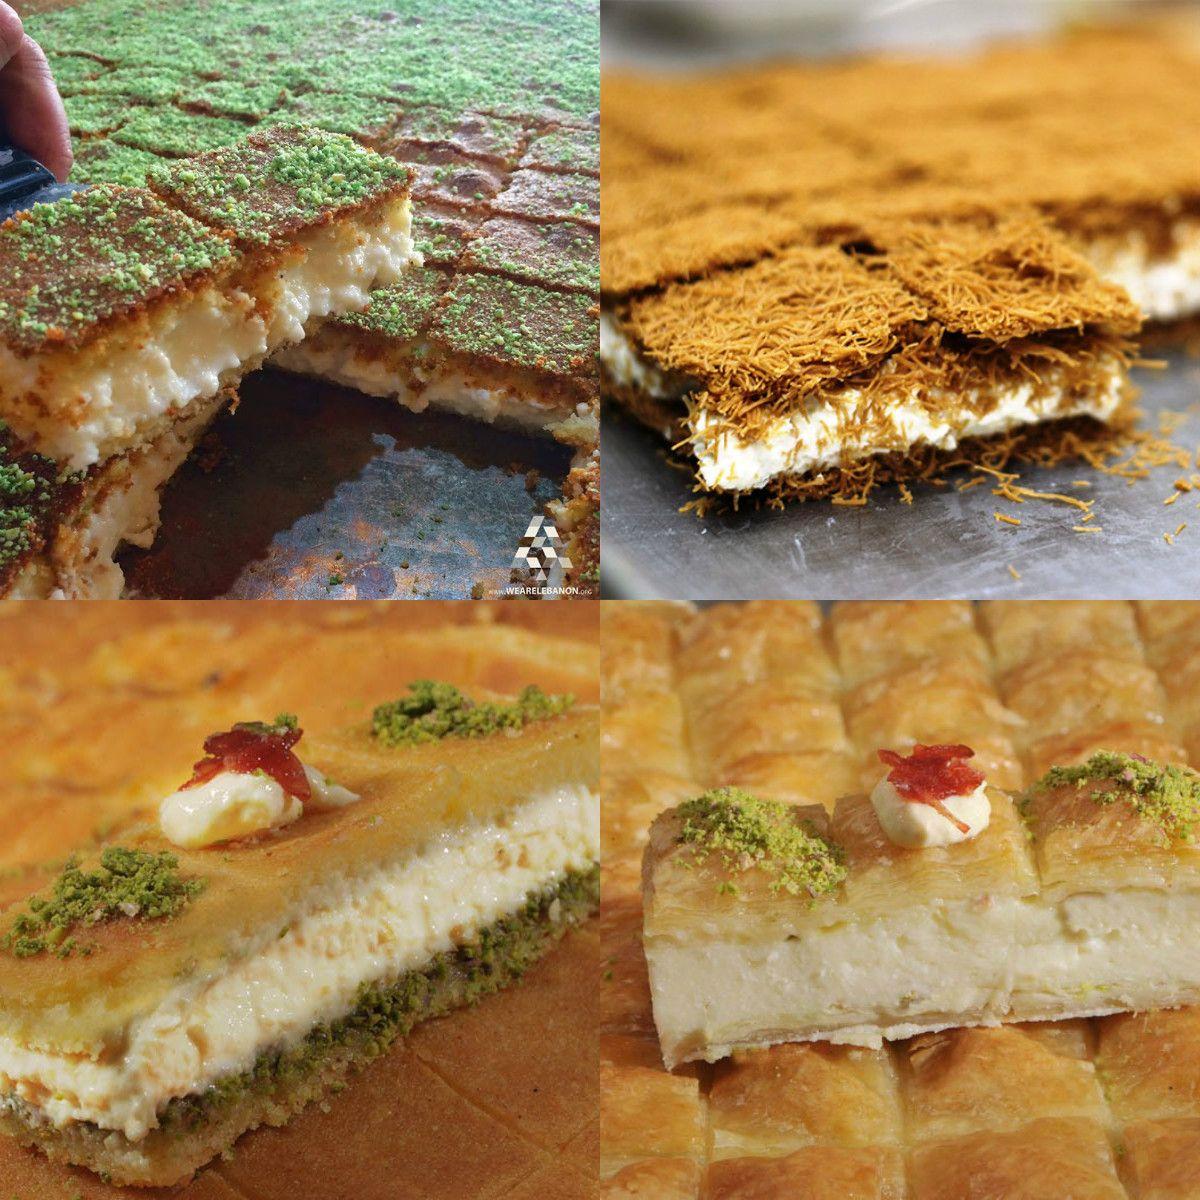 طريقة عمل معمول مد بالقشطة Arabic Sweets Recipes Arabic Sweets Middle Eastern Desserts